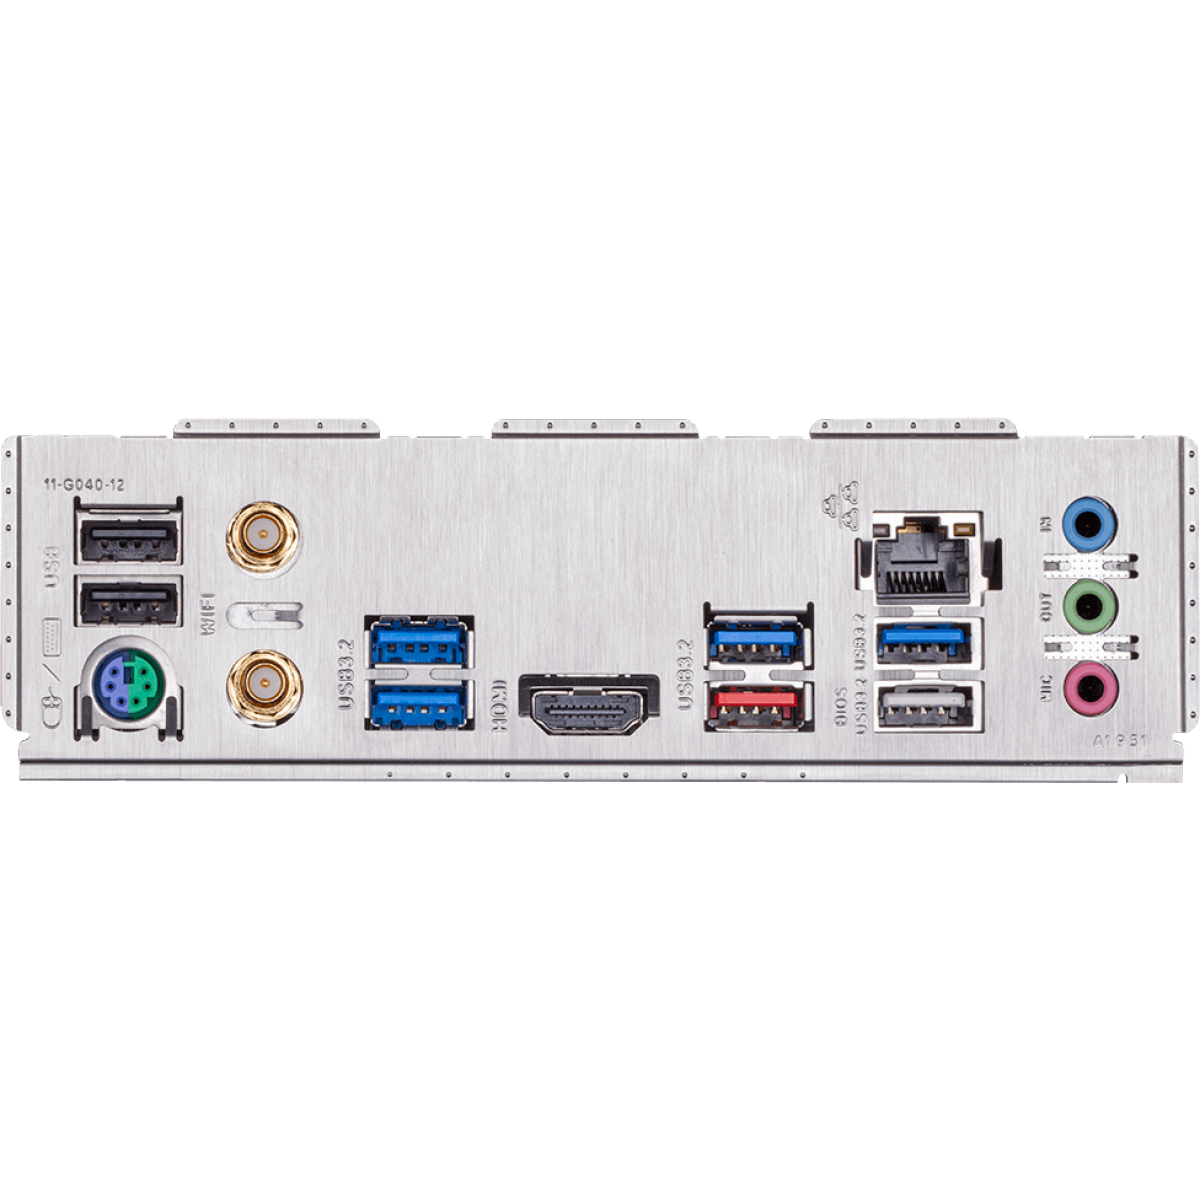 Placa Mãe Gigabyte Z490 UD AC, Chipset Z490, Intel LGA 1200, Wi-Fi, ATX, DDR4